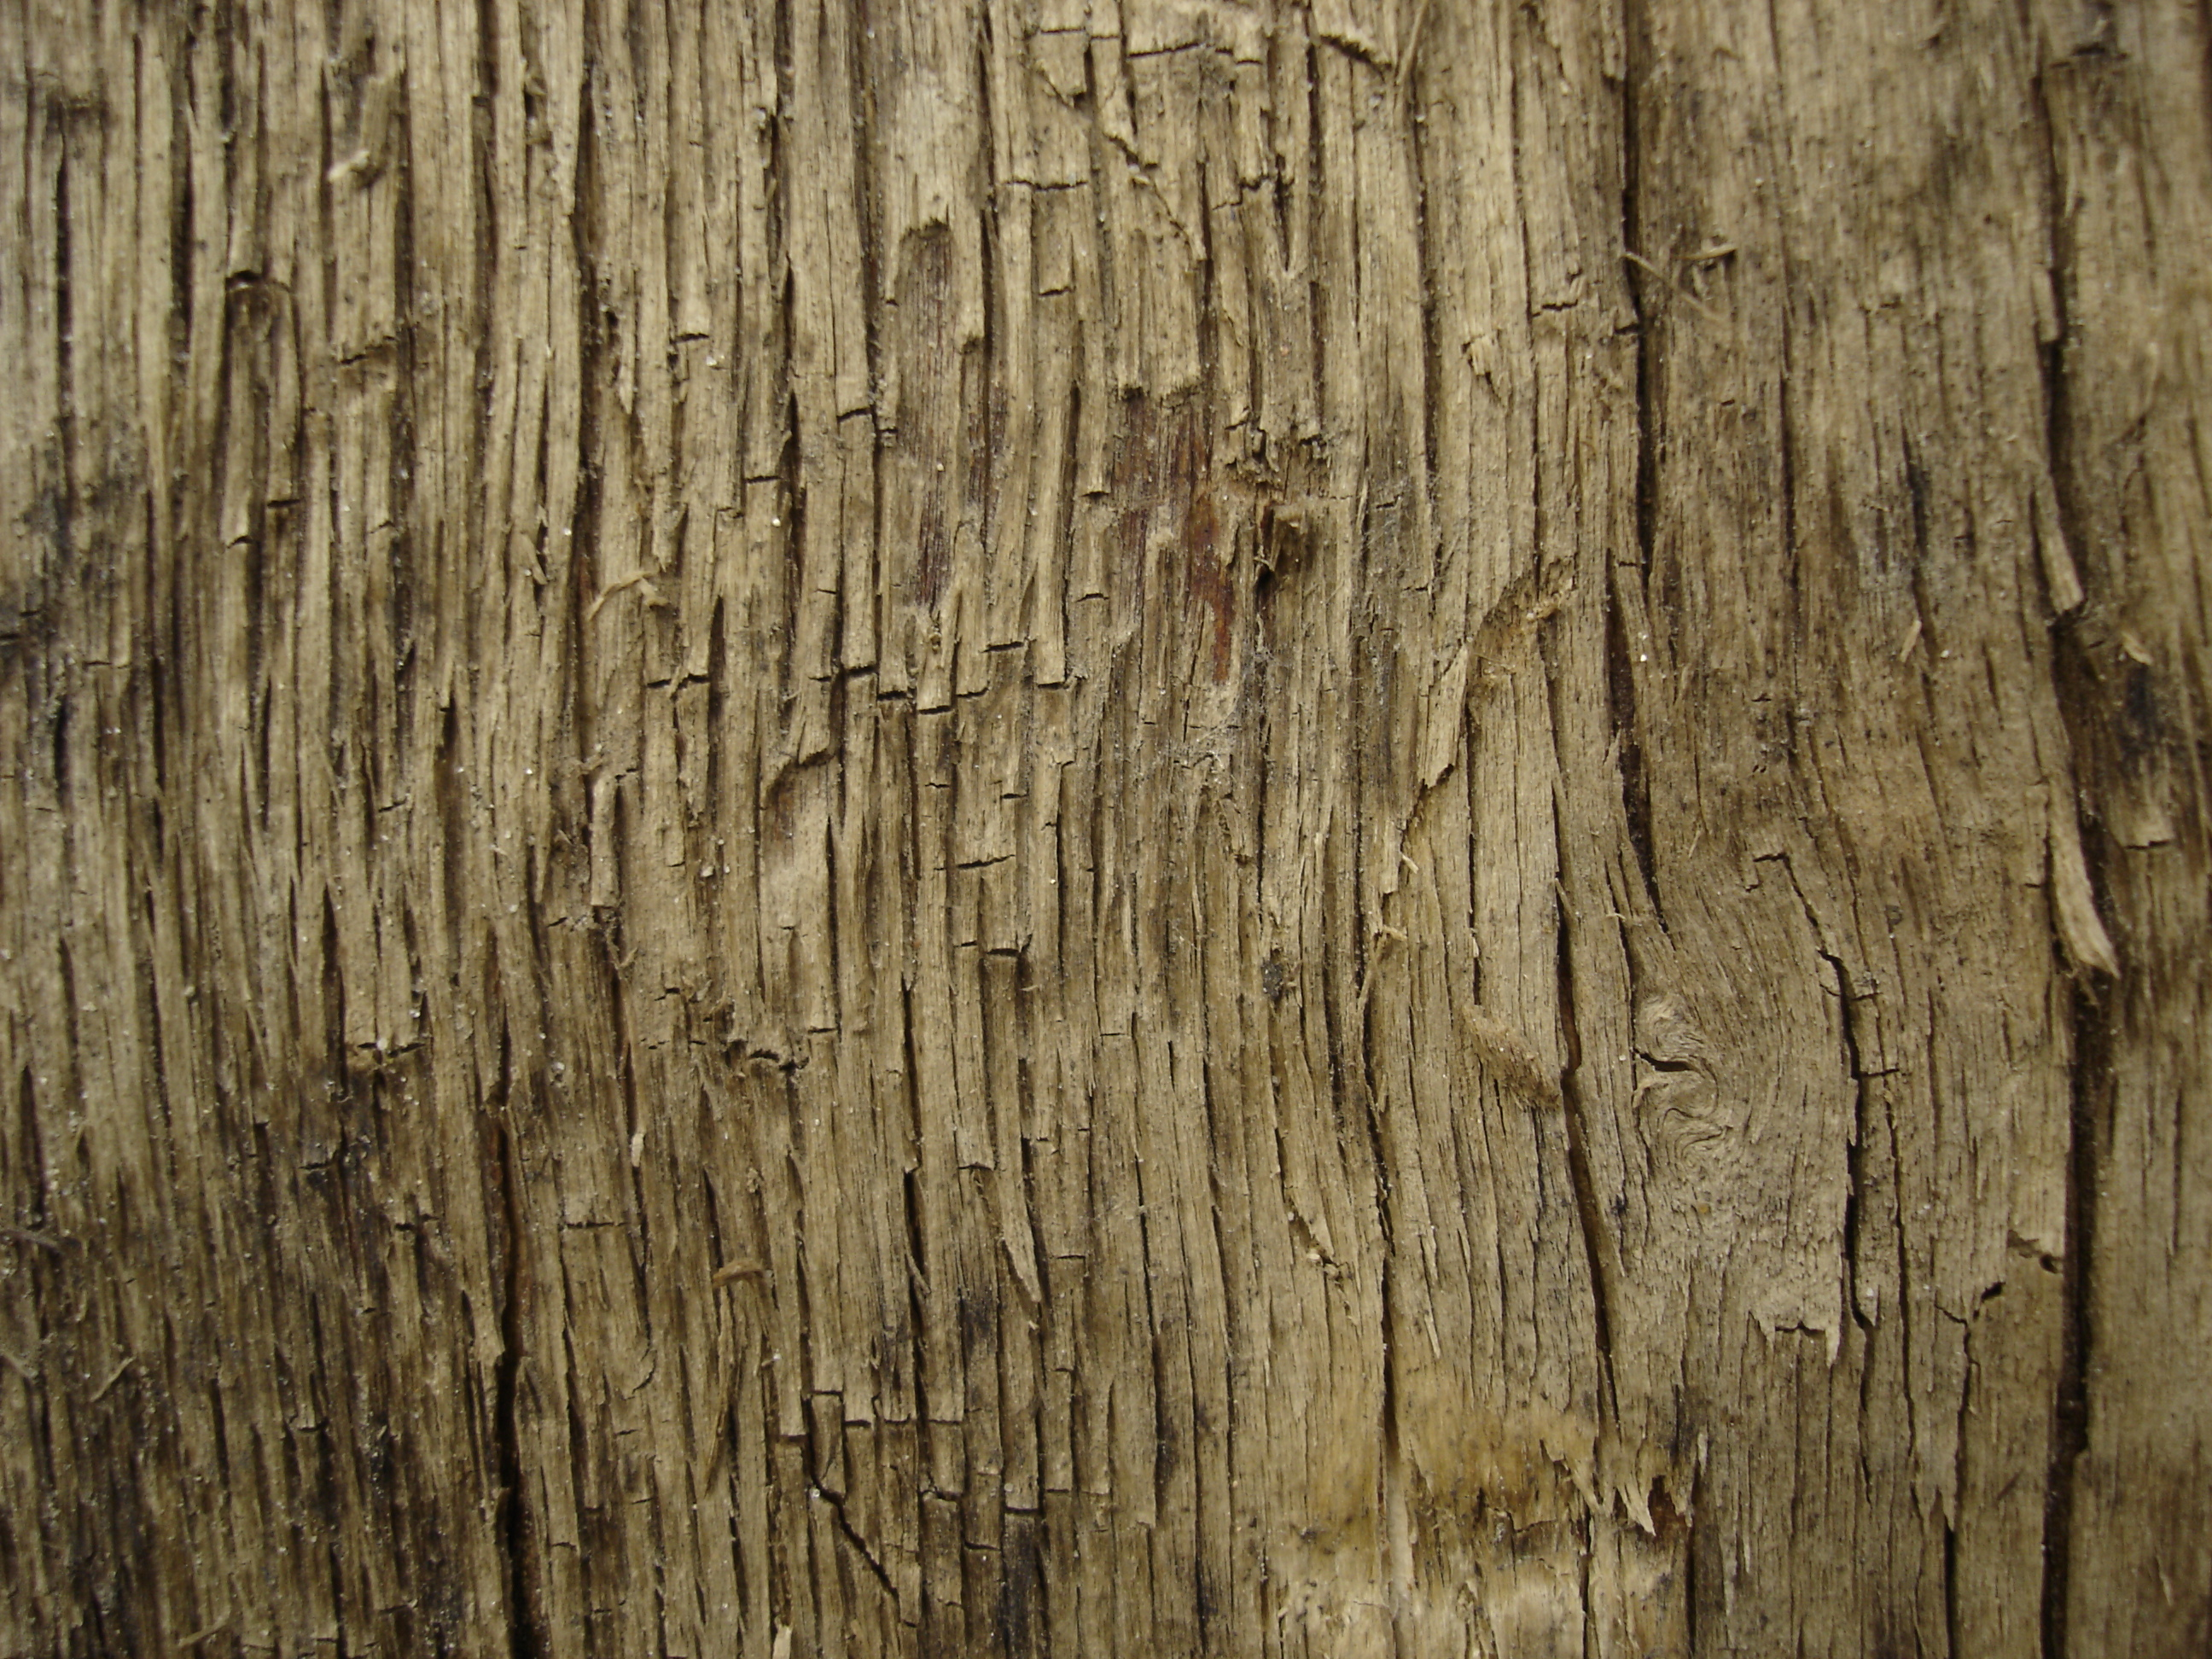 Tree_texture___11_by_LunaNYXstock Wood Christmas Tree